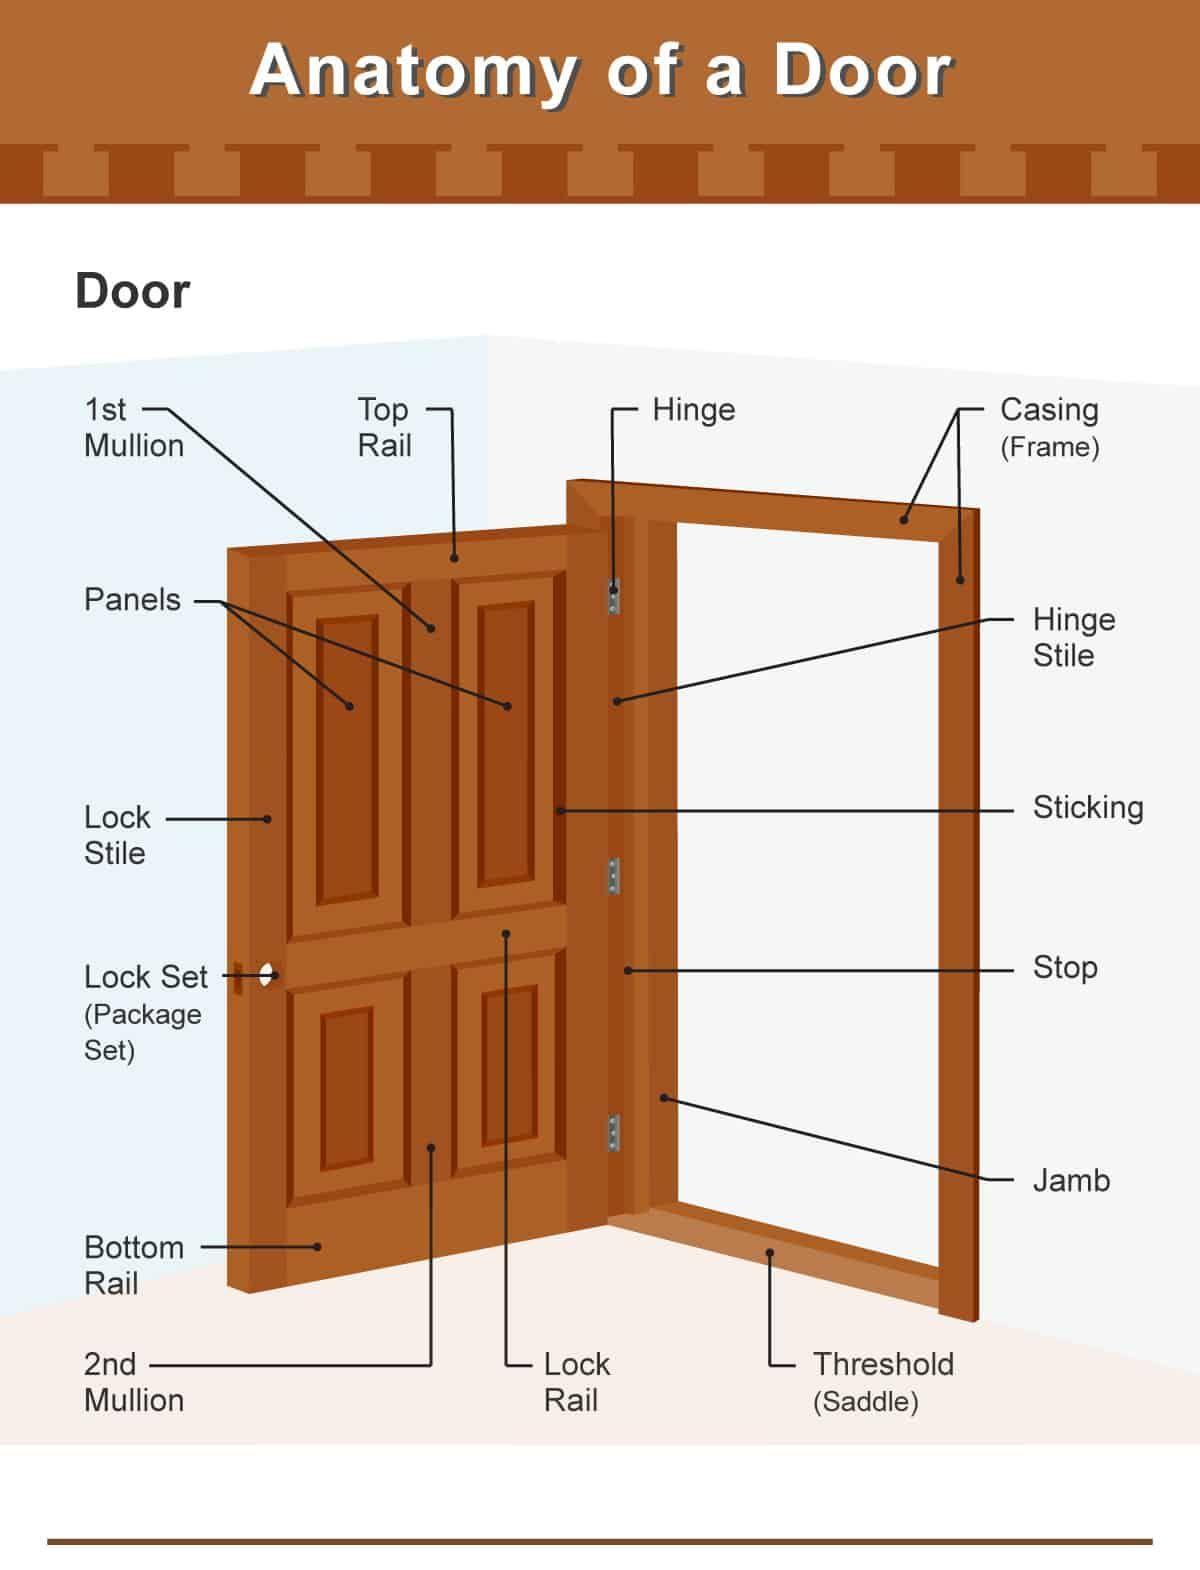 Parts Of A Check Diagram : parts, check, diagram, Architecture, Vocabulary